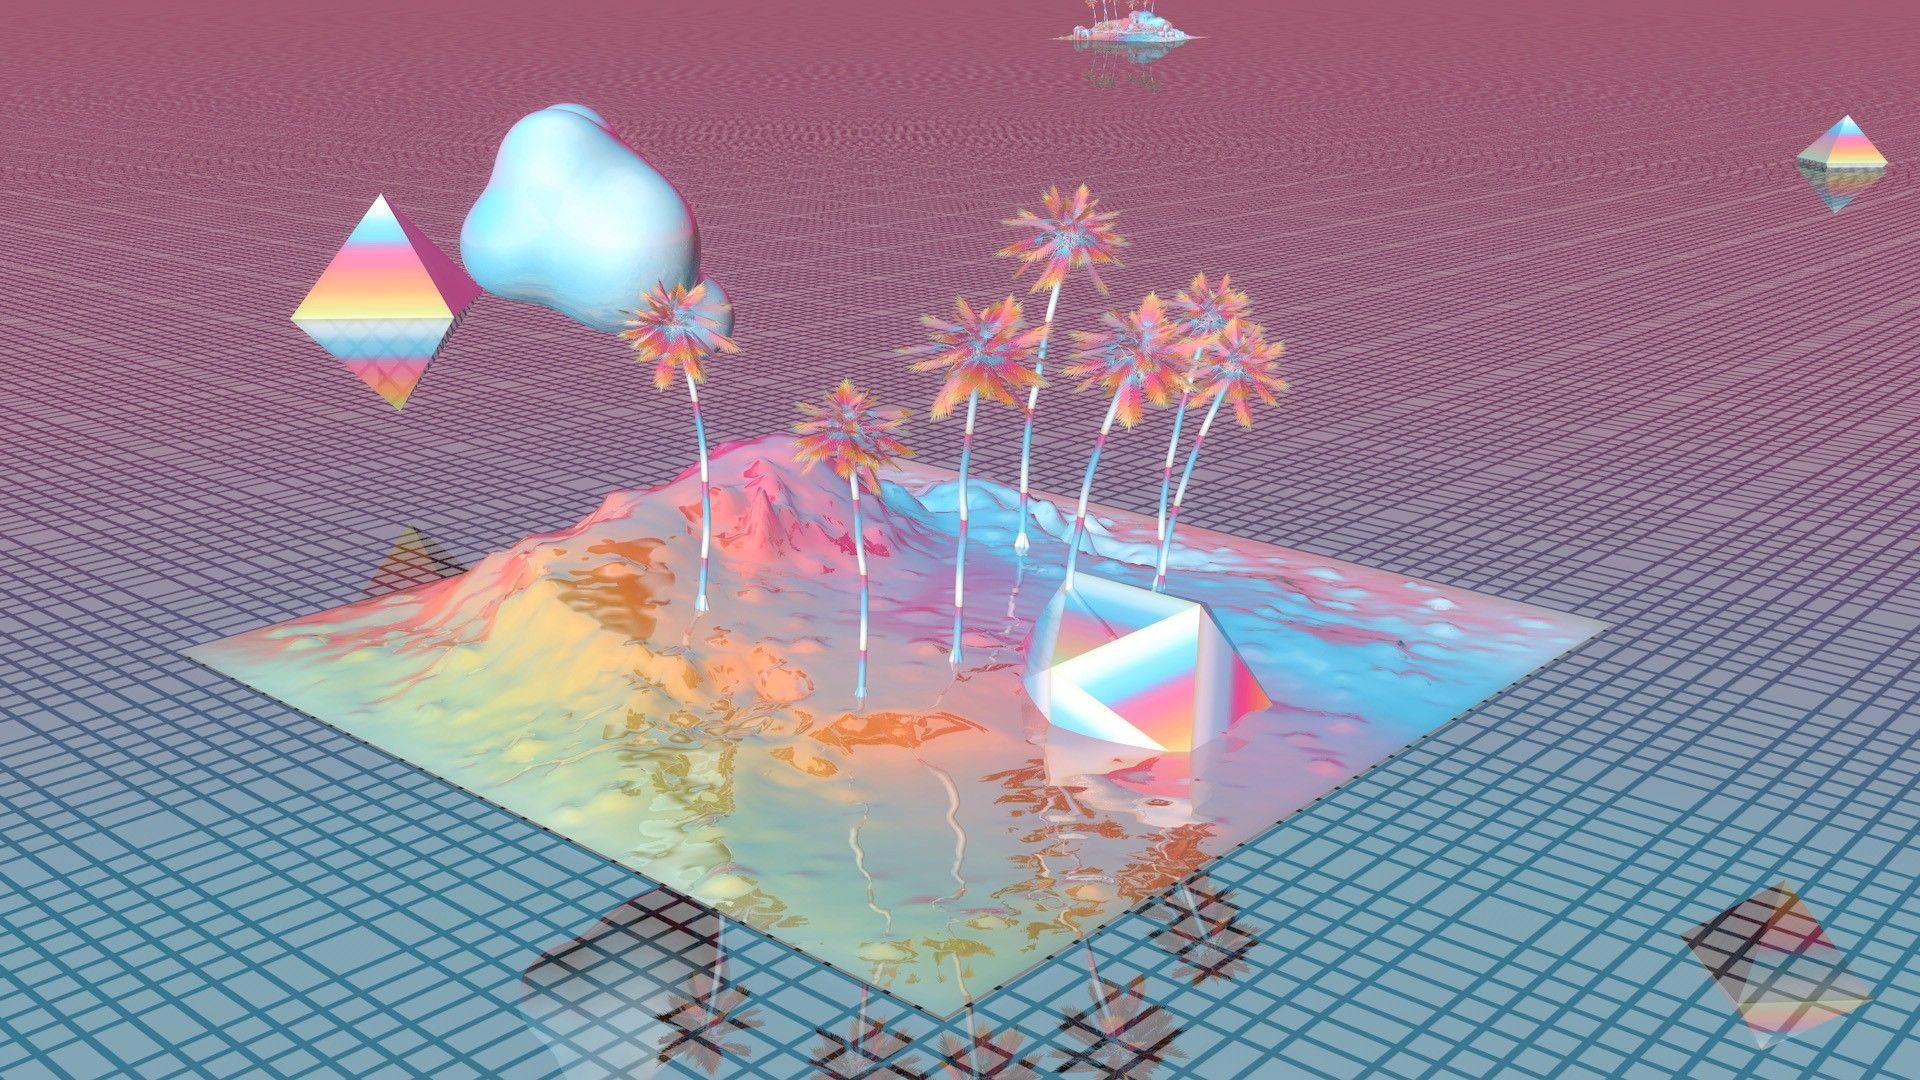 This gif has everything glitch pixel art graphic design vaporwave - Related Image Vaporwave Wallpaperdesign Arthd